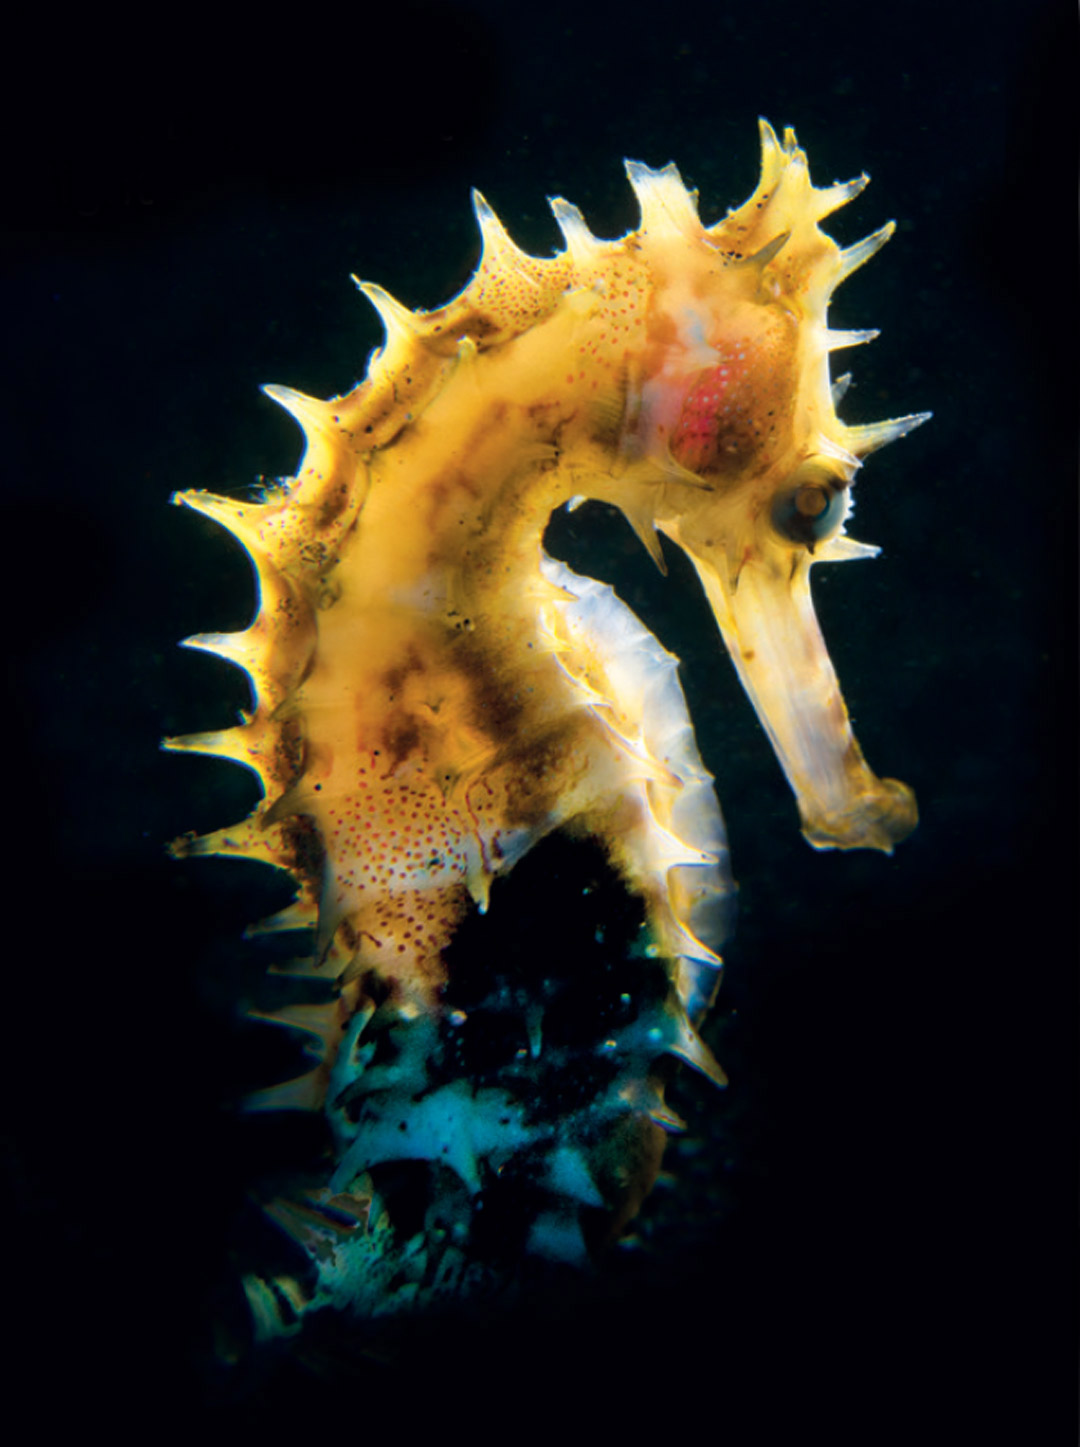 Scuba Travel, diving holidays, scuba diving, macro photography, seahorse, Indonesia